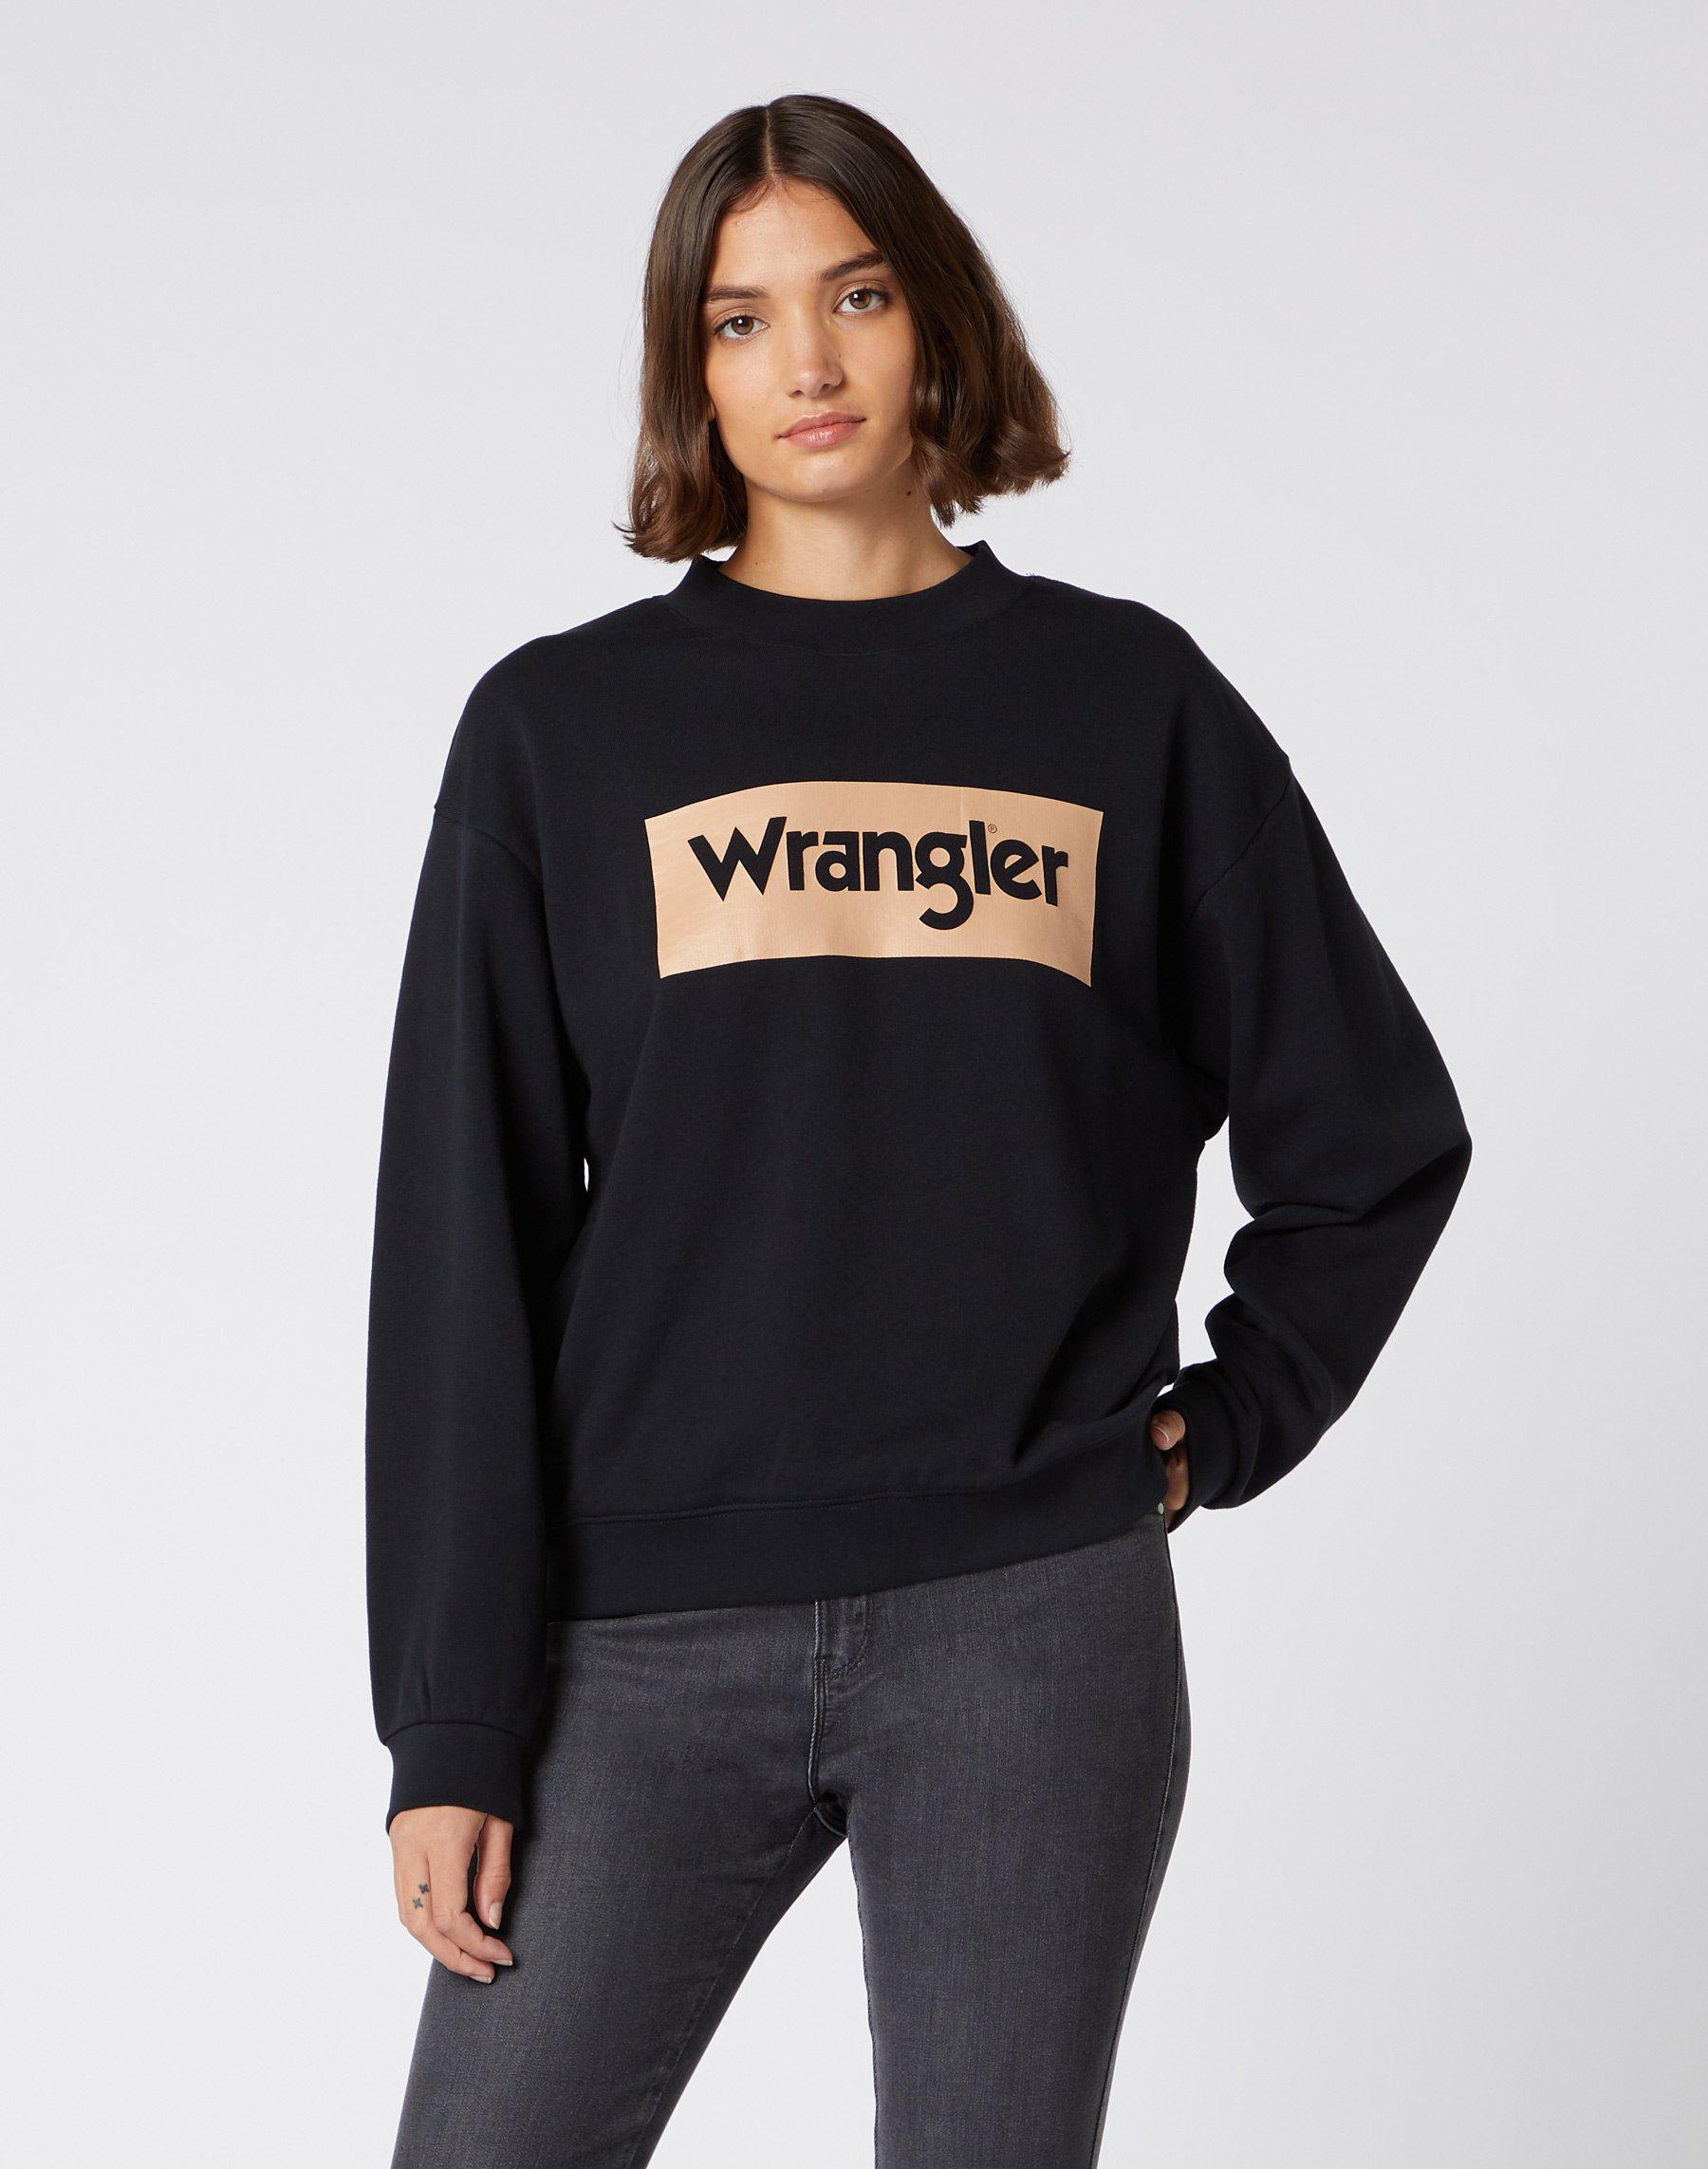 Wrangler Dames truien & vesten online | ZALANDO